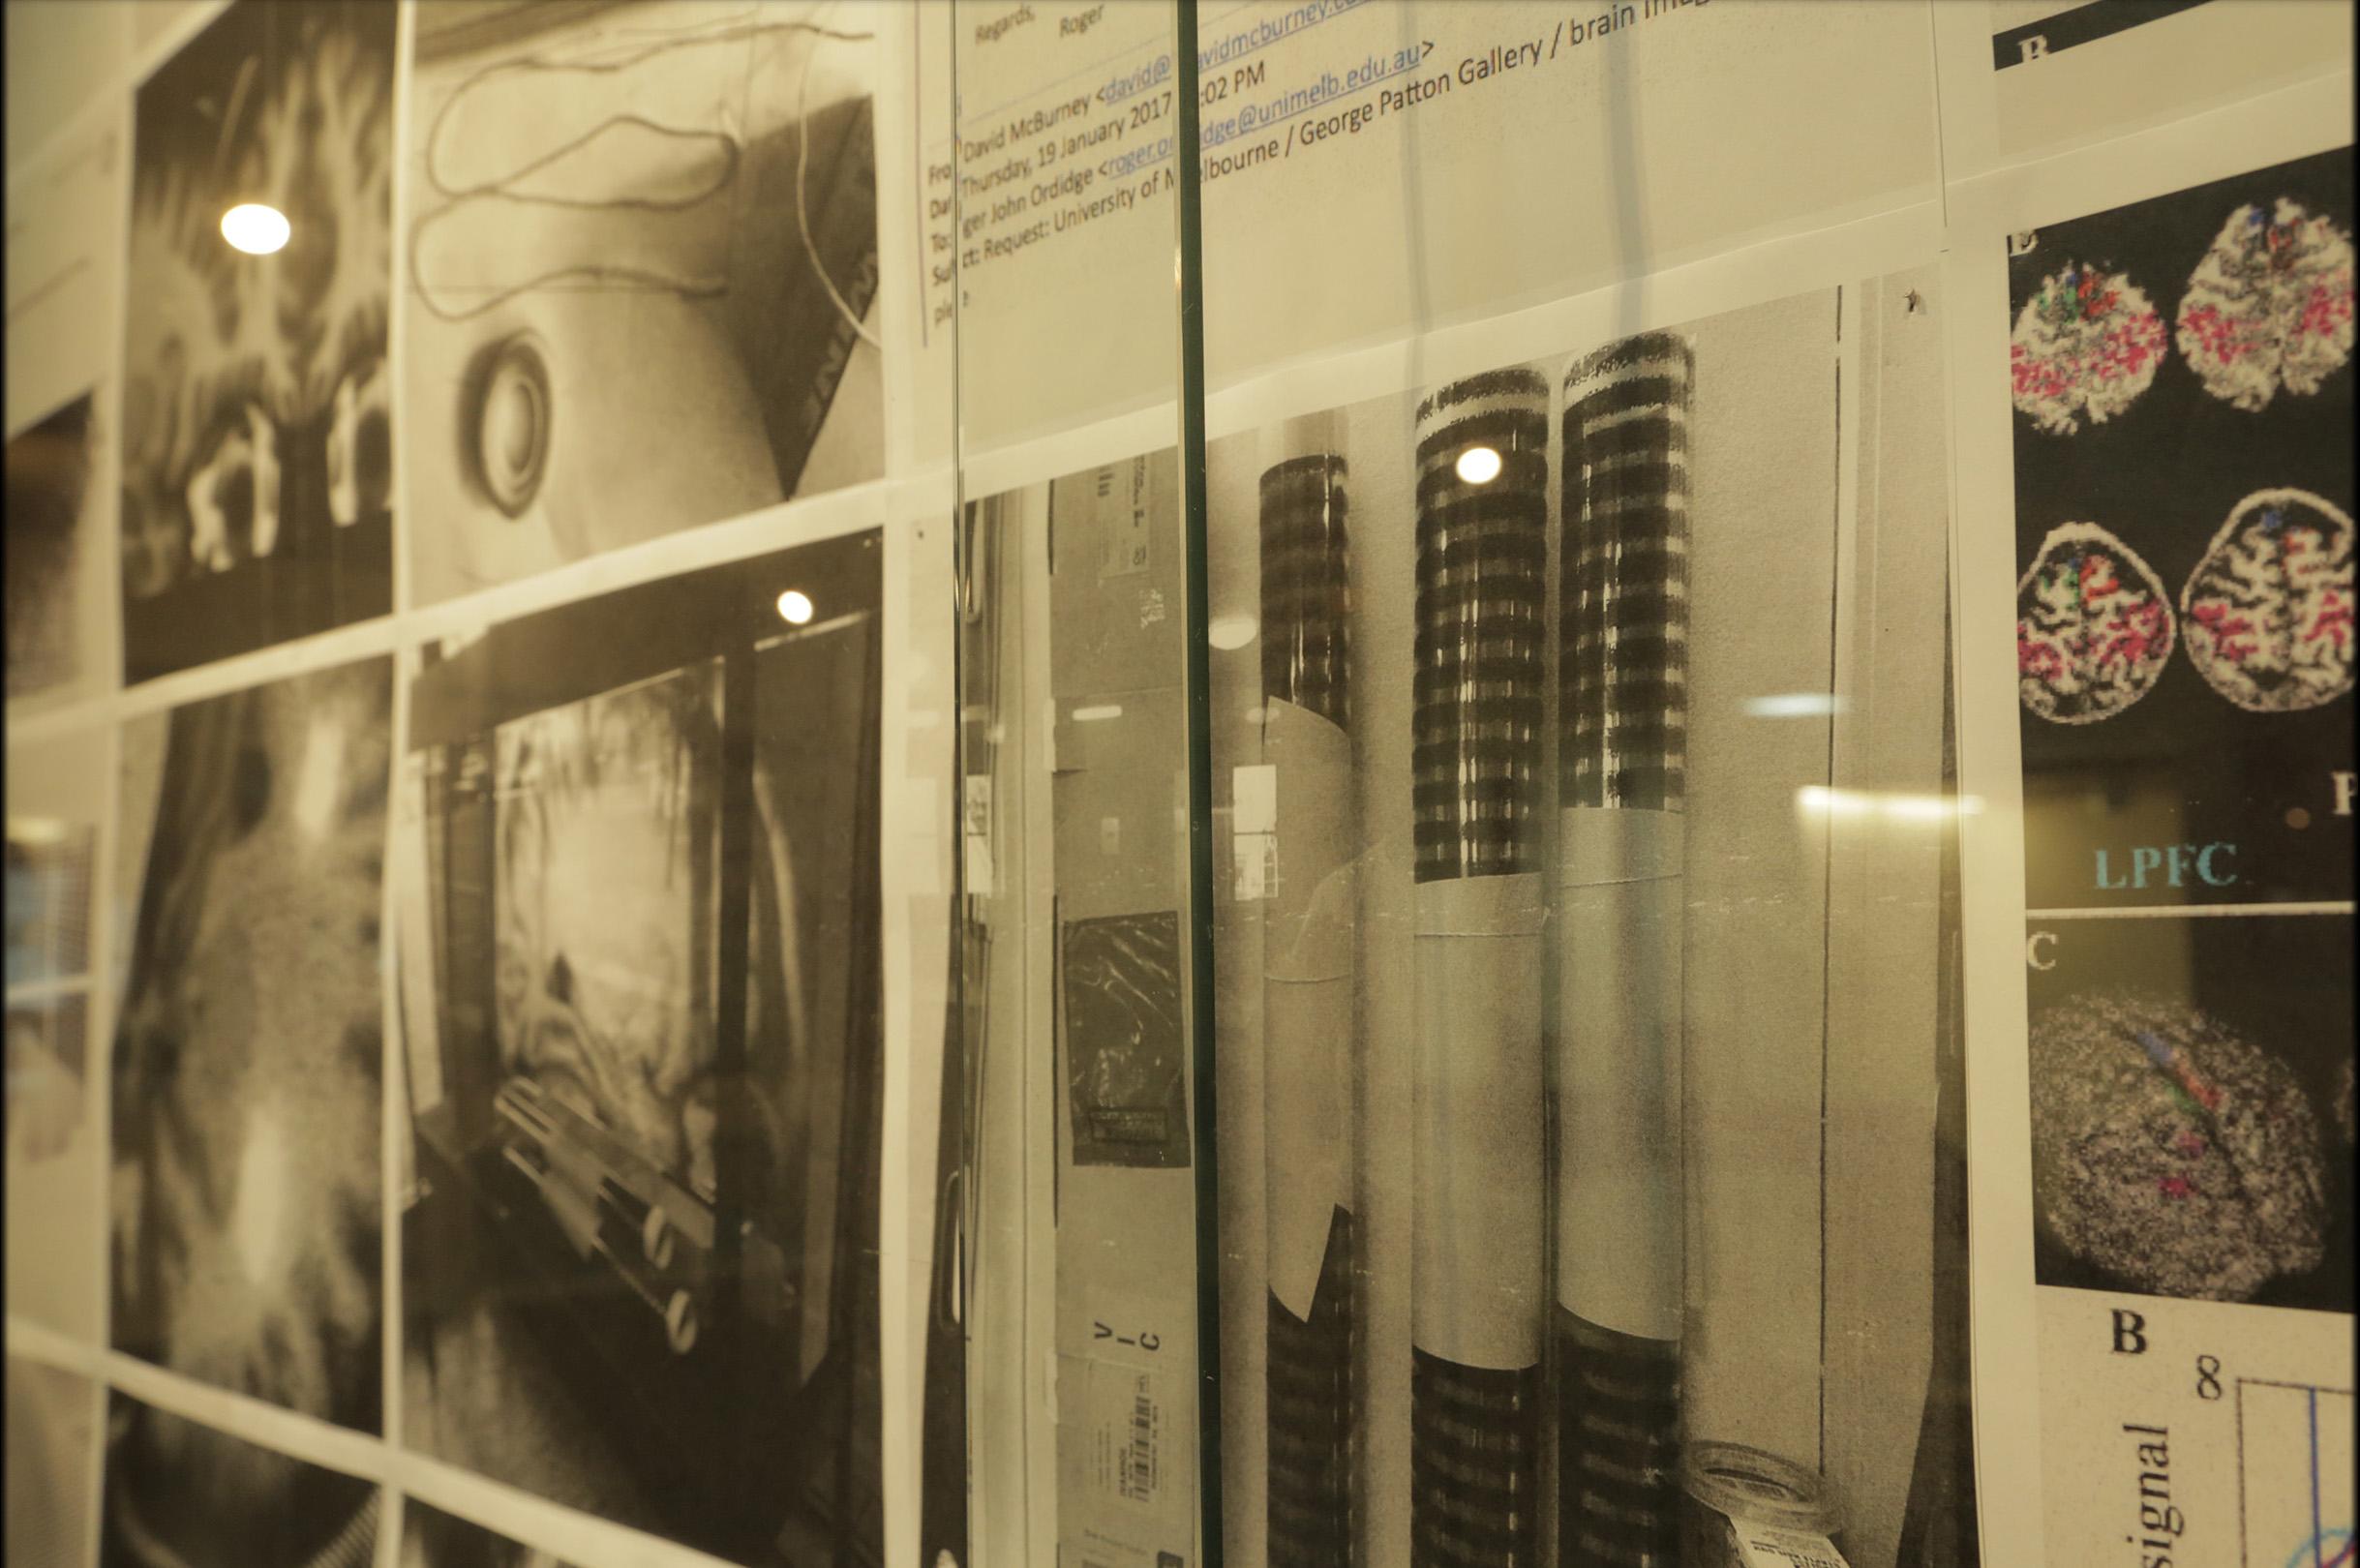 David-McBurney-west-vitrine-a